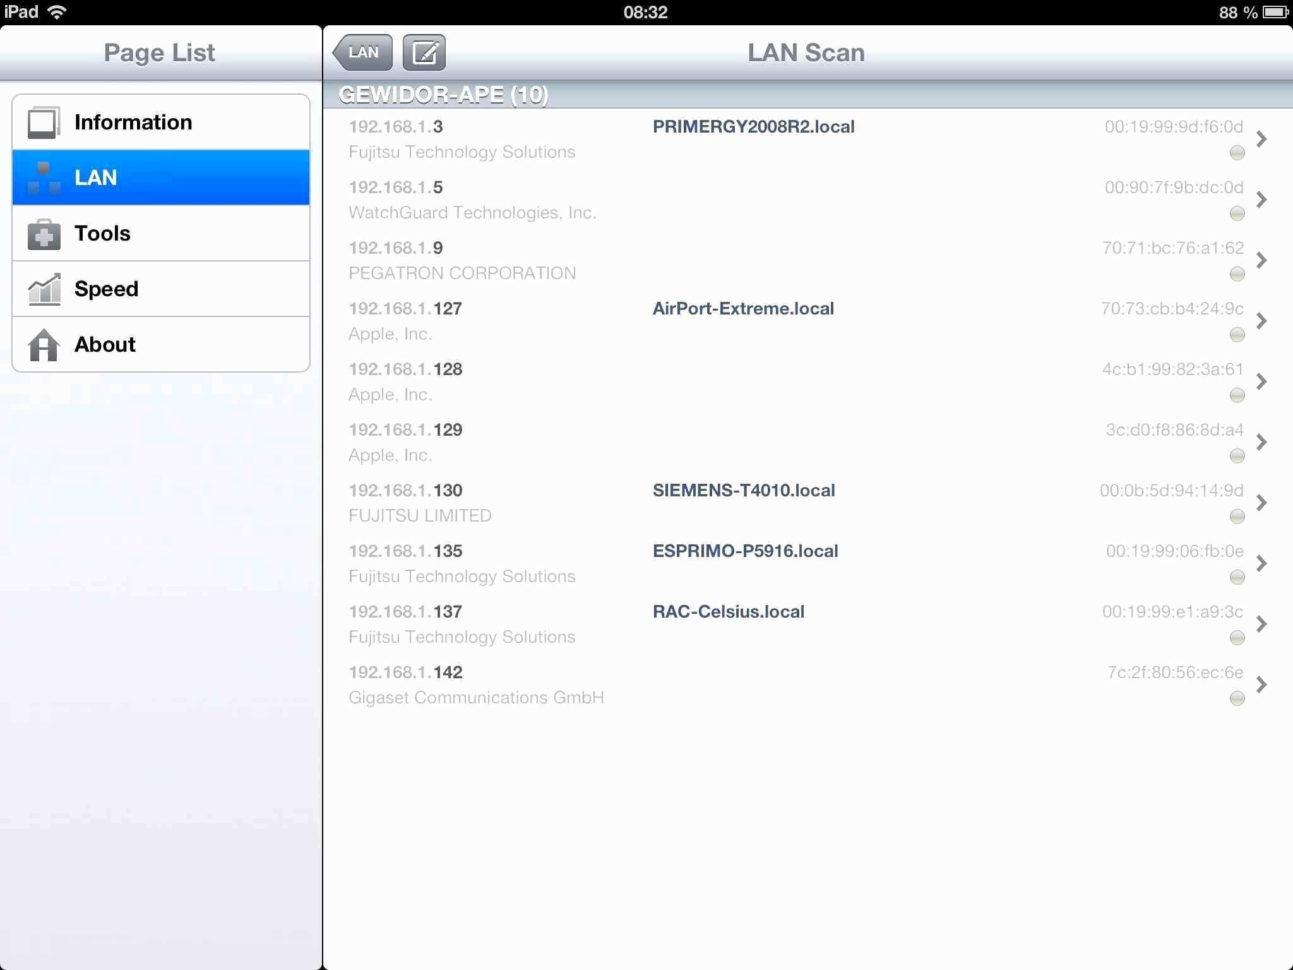 Ammunition Inventory Spreadsheet Inside Free Inventory Spreadsheet .free Inventory Spreadsheet